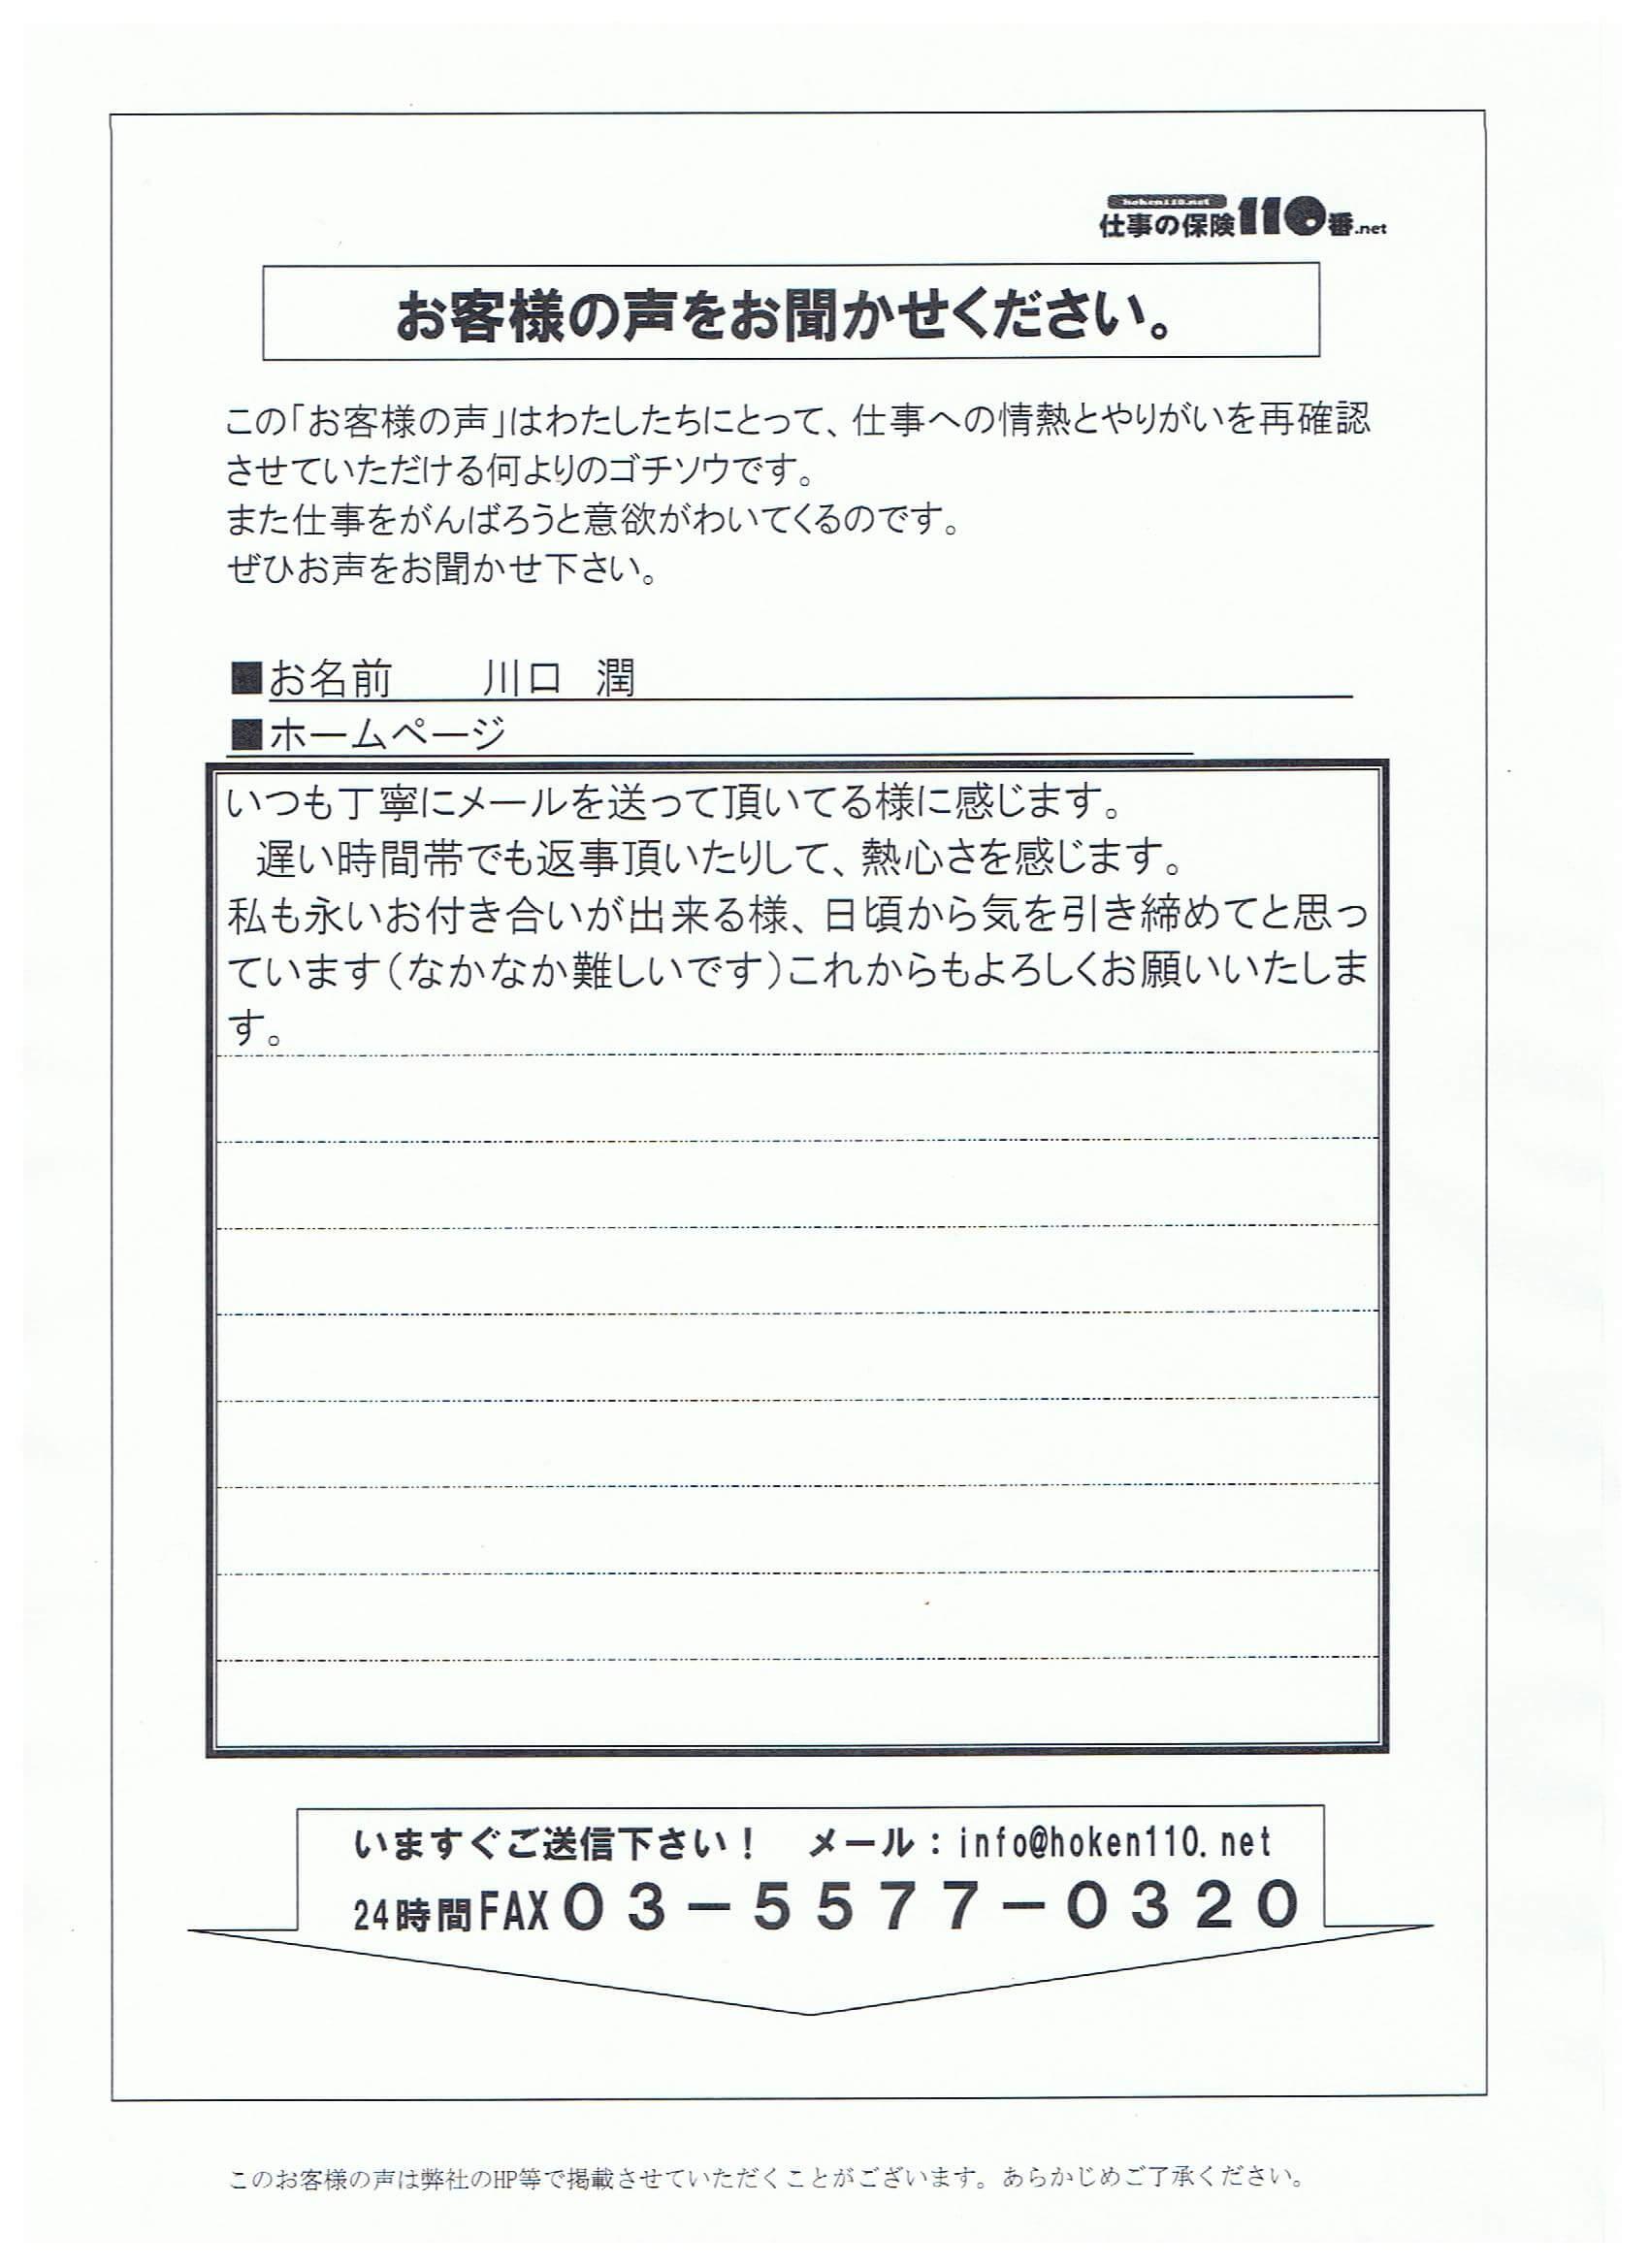 kawaguchisankoe.jpg